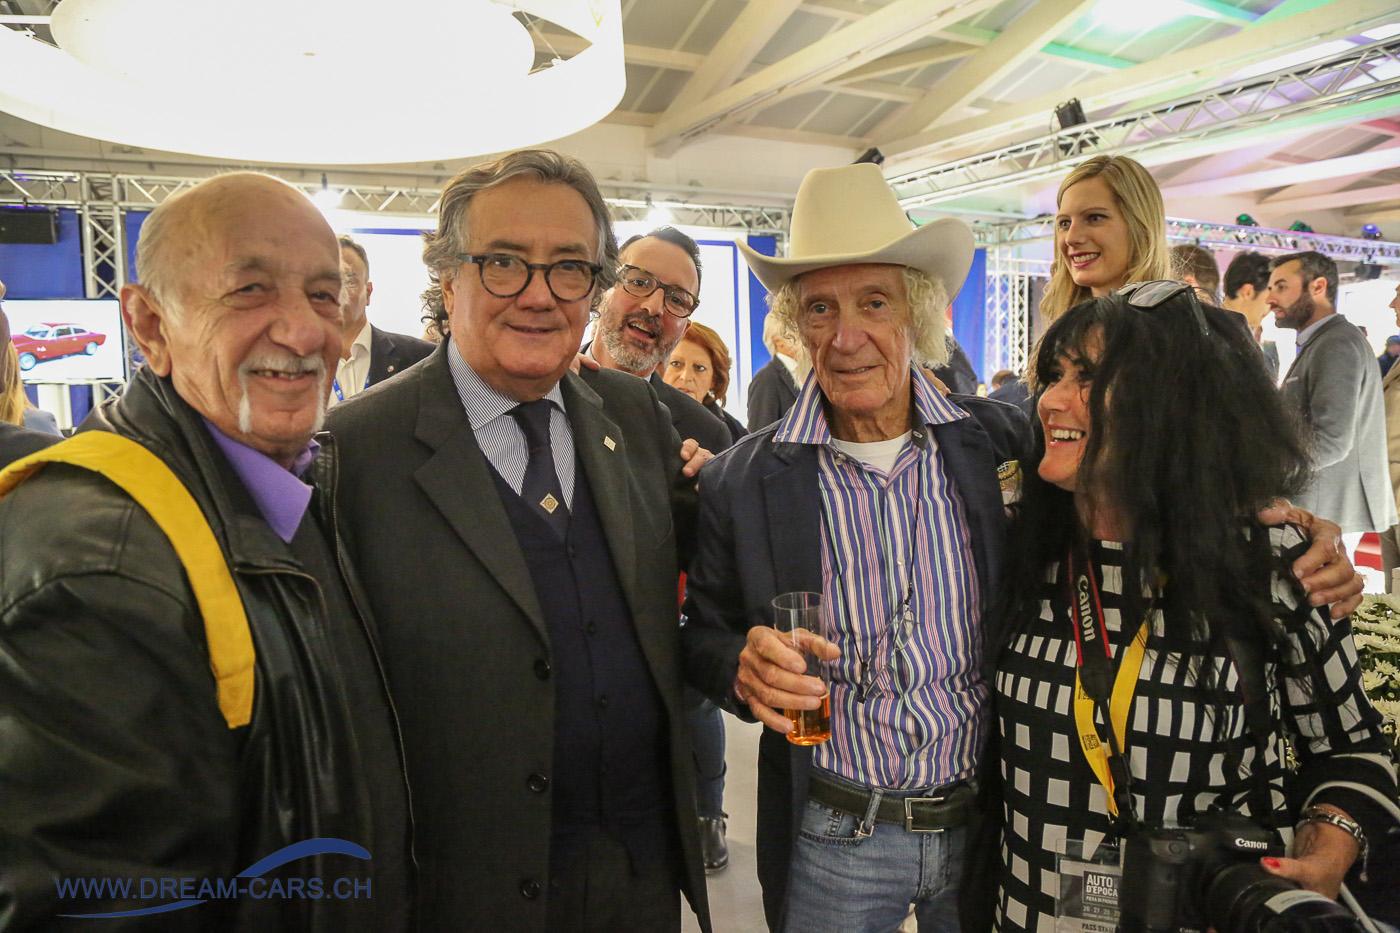 Auto Moto d'Epoca Padua 2017. Von links: Ermanno Cuoghi, Giancarlo Minardi, Arturio Merzario und Ela Lehmann